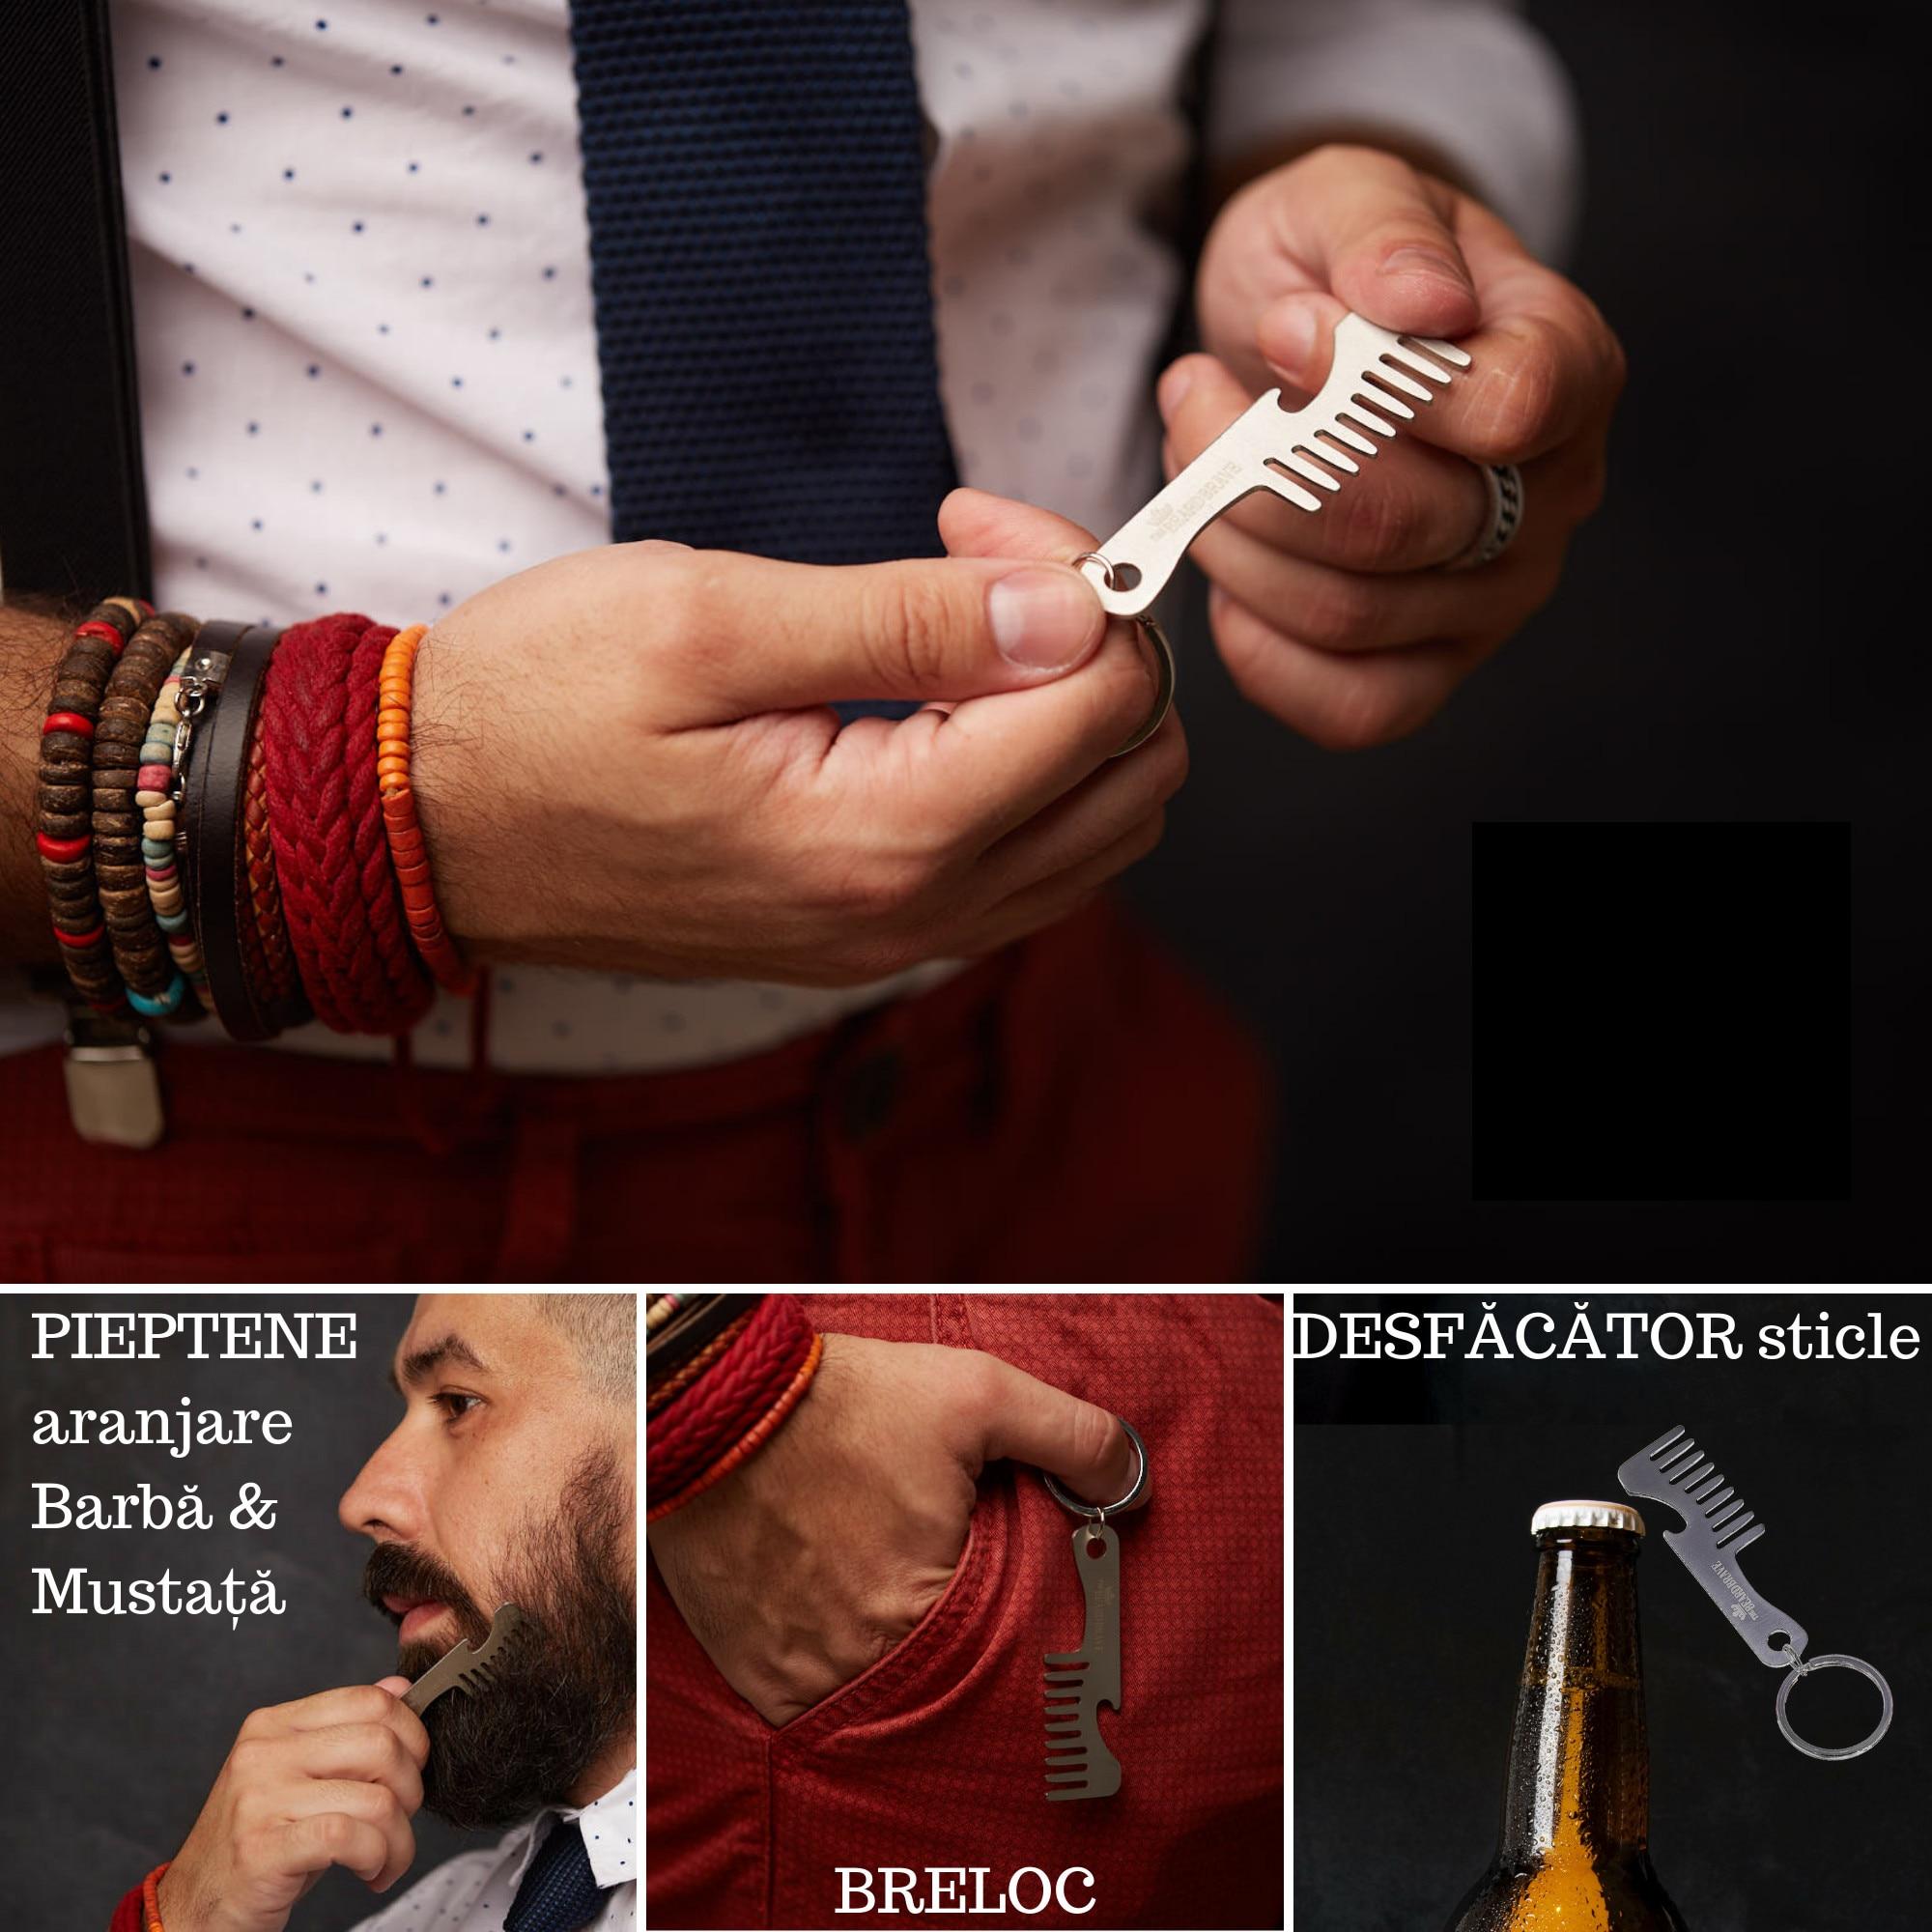 Lotto POLO DELTA alb XXXL - Tricou polo bărbați (46 produse) - constructii-amenajari-tulcea.ro